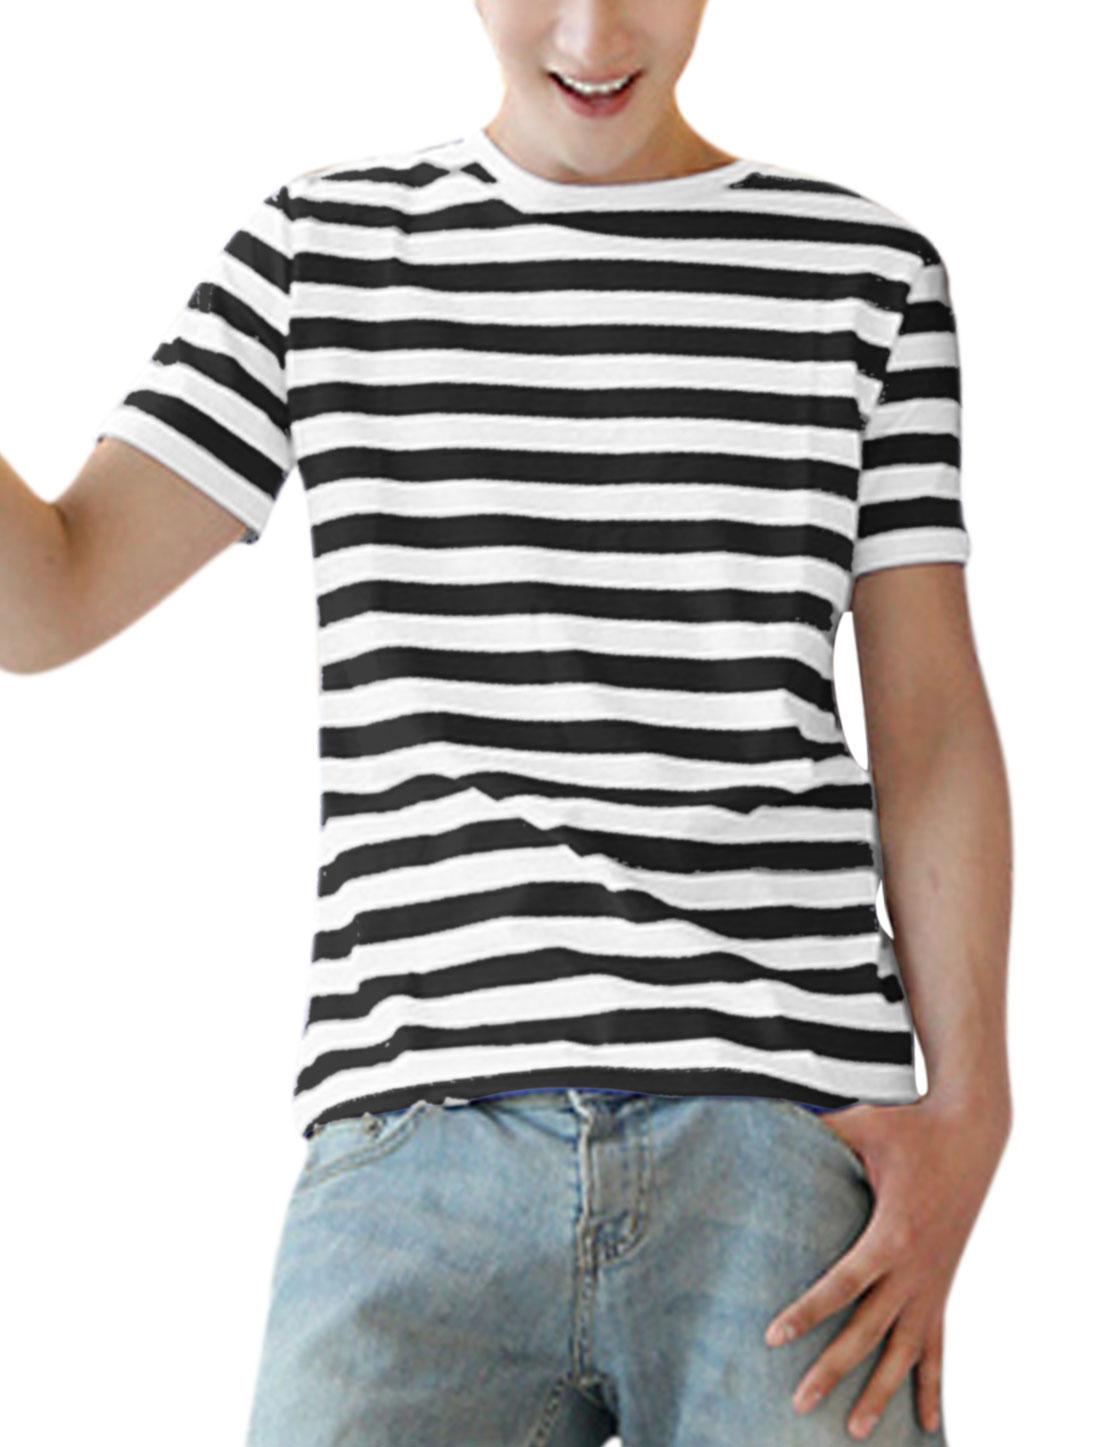 Men Stripes Pattern Short Sleeve Summer Fit Casual Tee Shirt Black White S